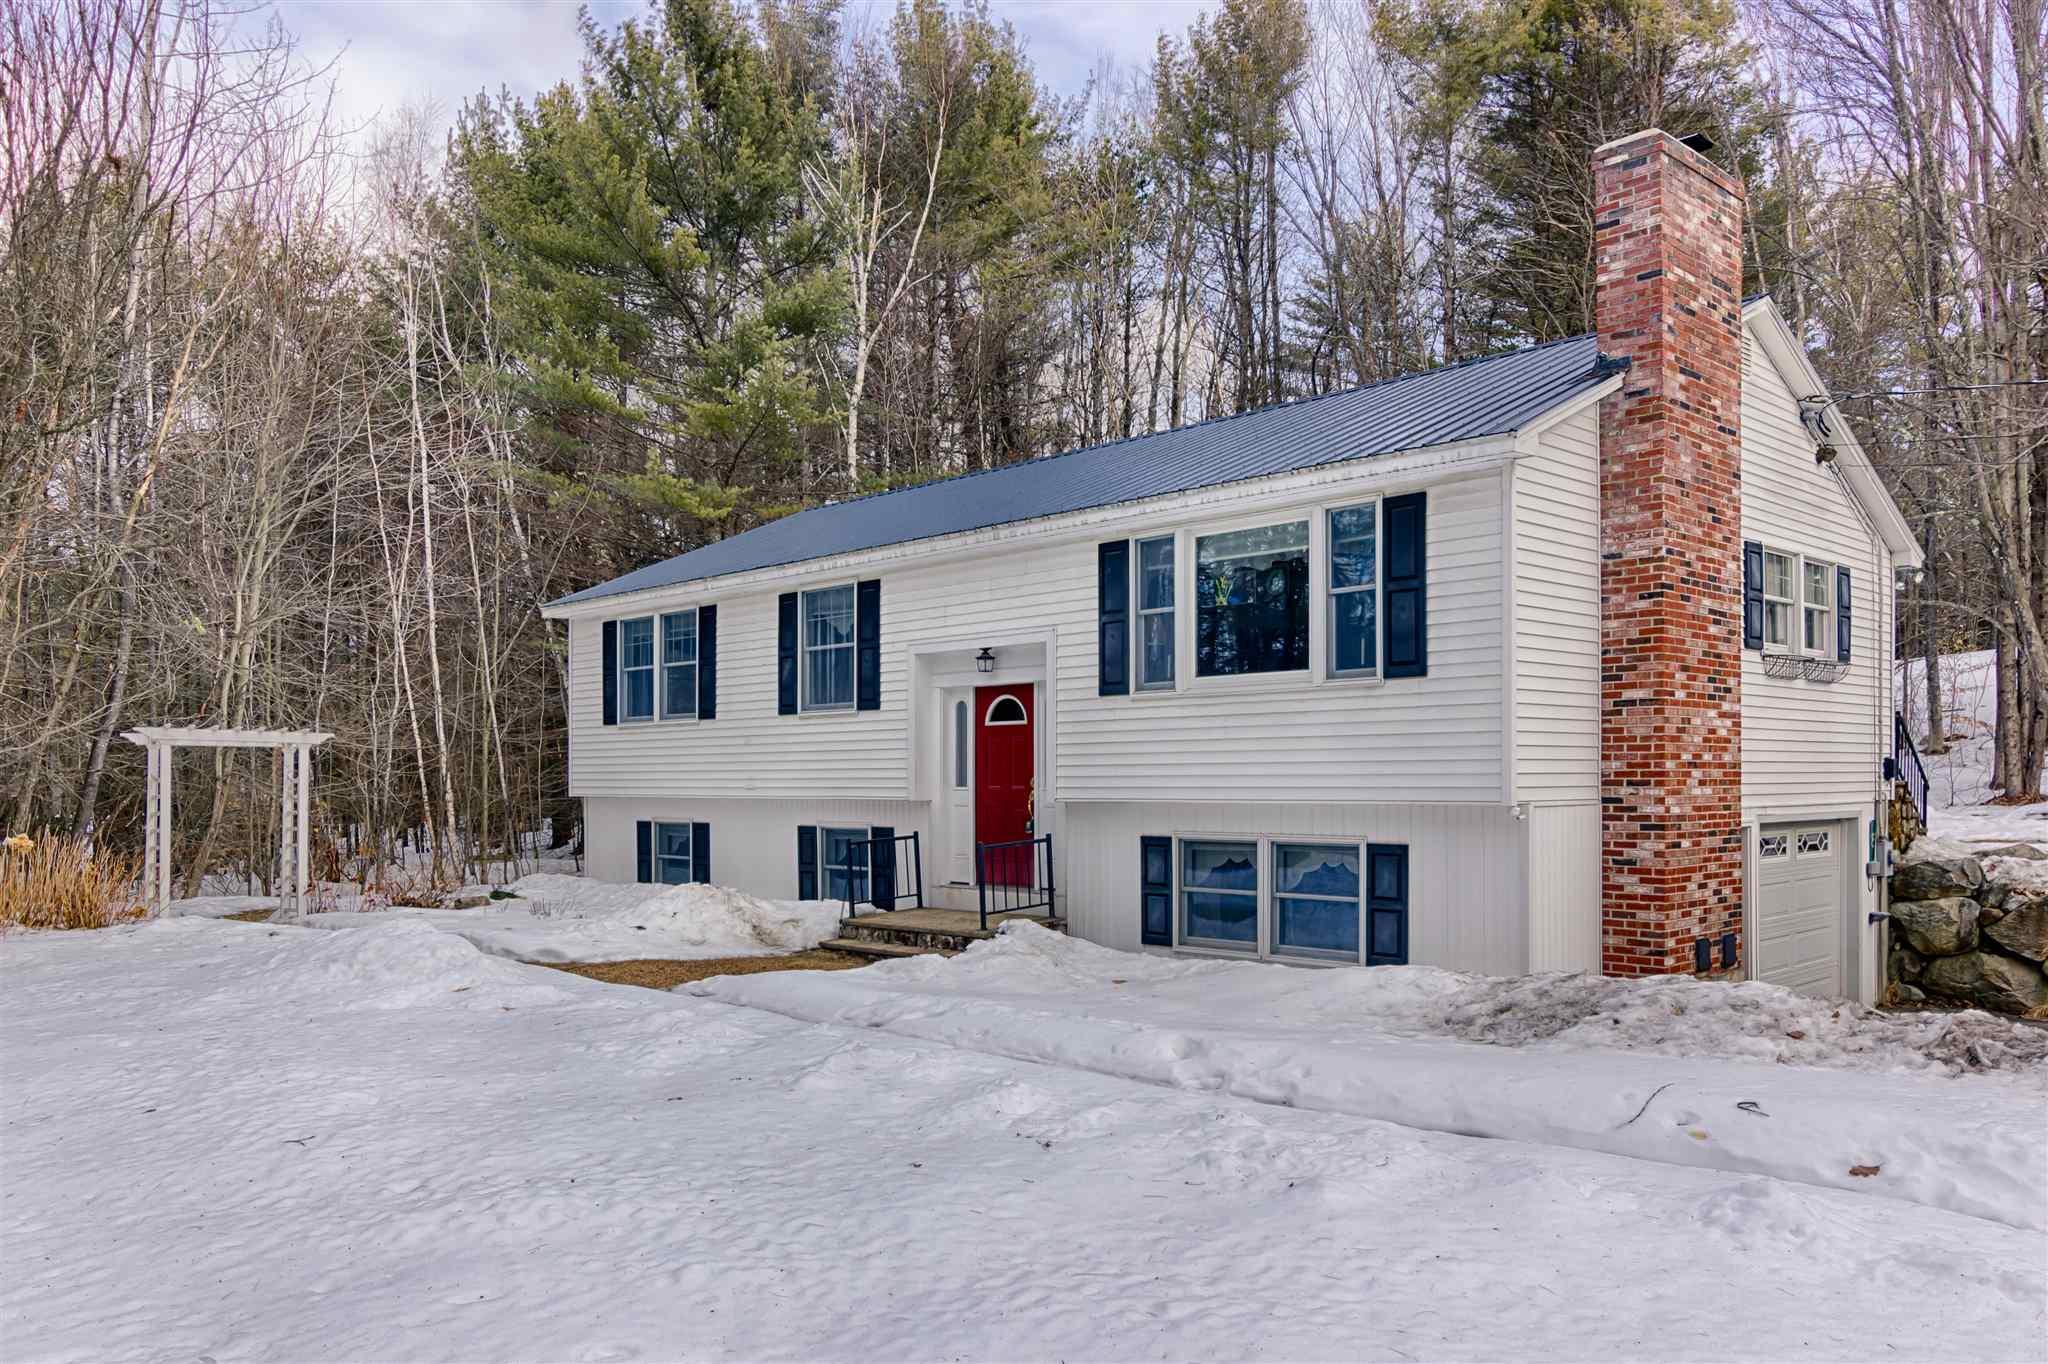 Village of Center Tuftonboro in Town of Tuftonboro NHHome for sale $$299,000 $233 per sq.ft.